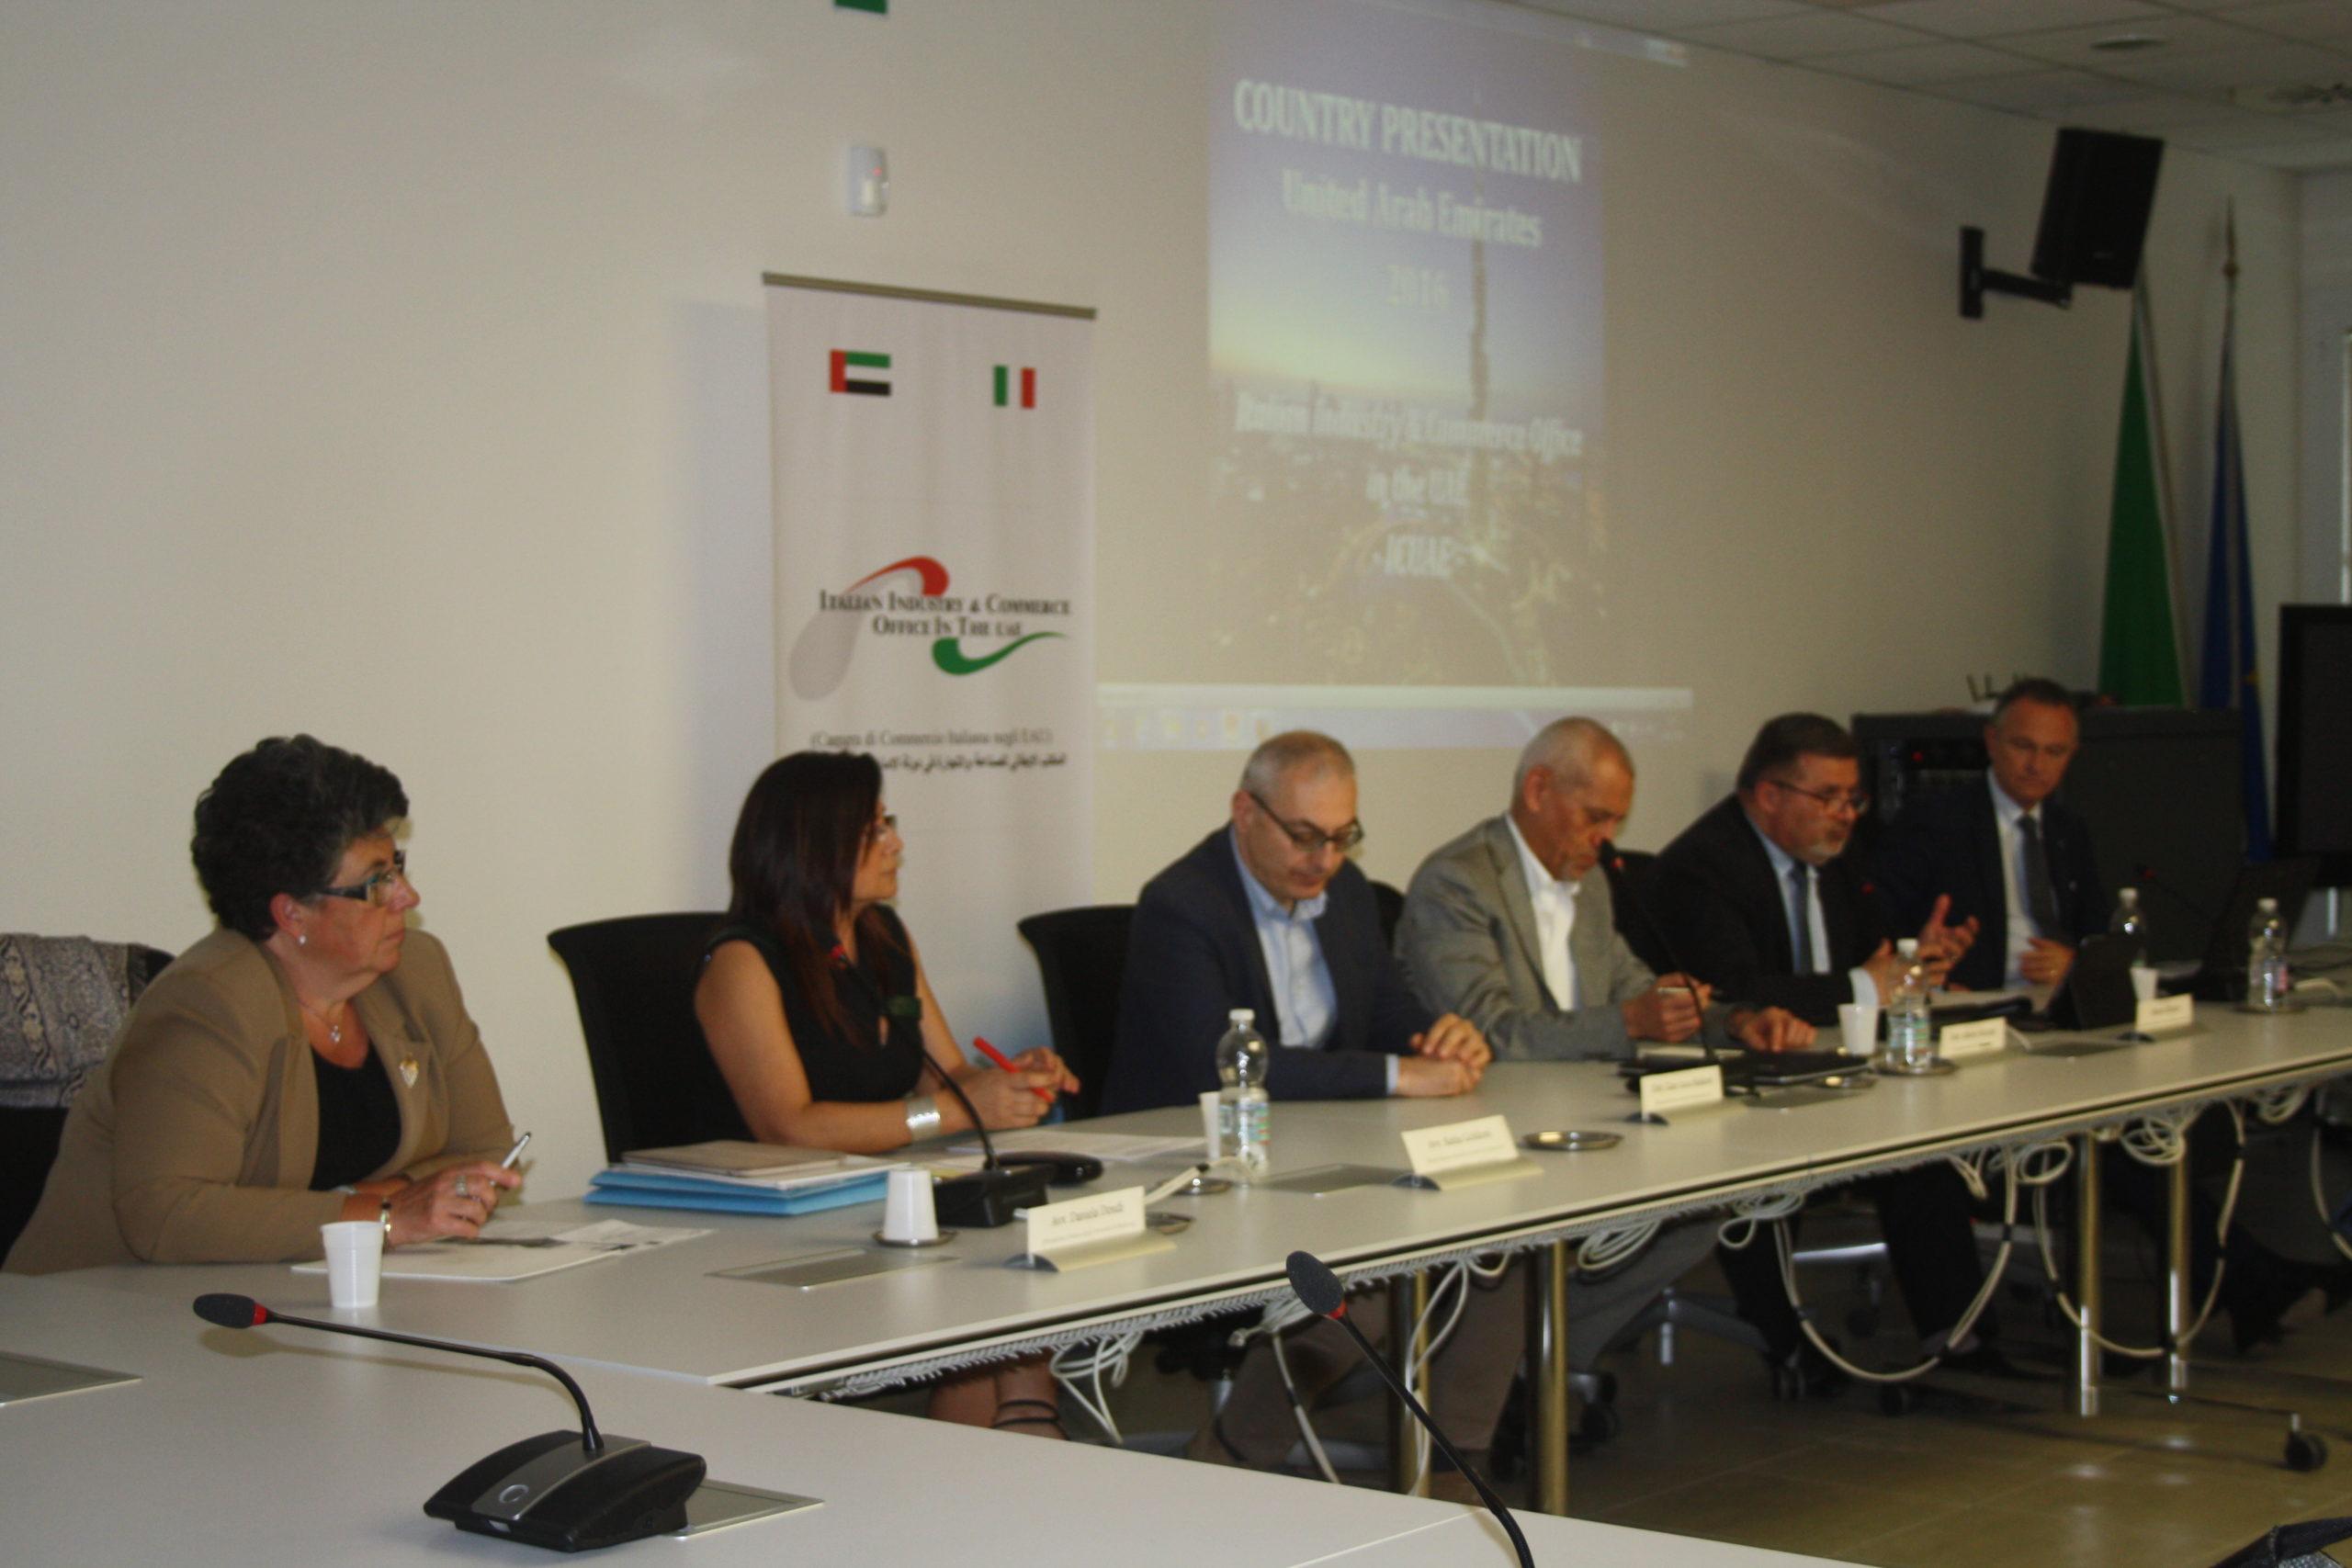 da sinistra Daniela Dondi, Katia Goldoni, Gianluca Baldoni, Alberto Nicolini, Alberto Silvestri, Mauro Marzocchi